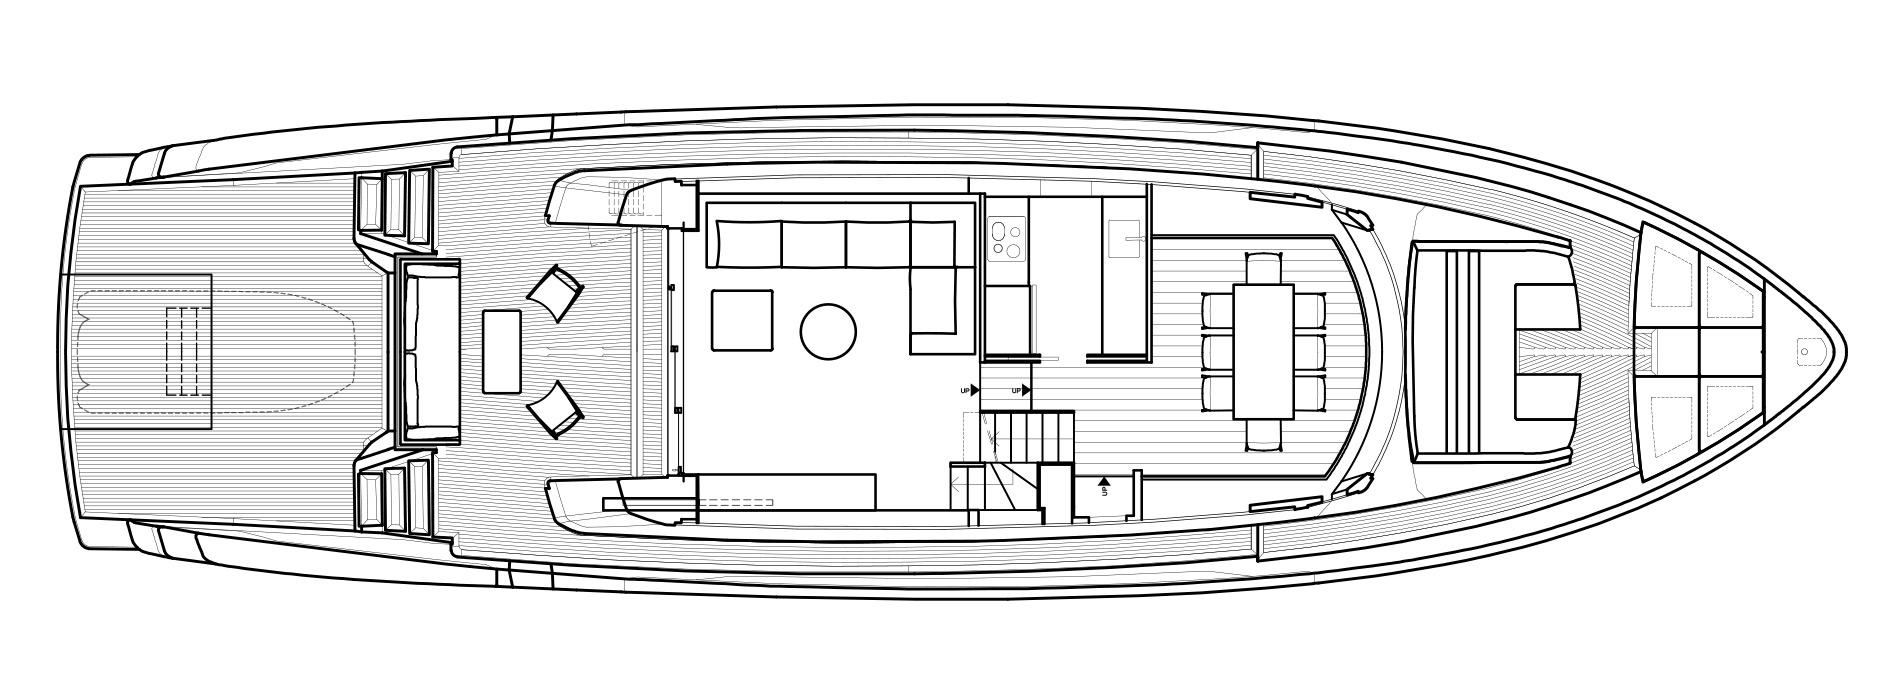 Sanlorenzo Yachts SX76 Главная палуба версия A